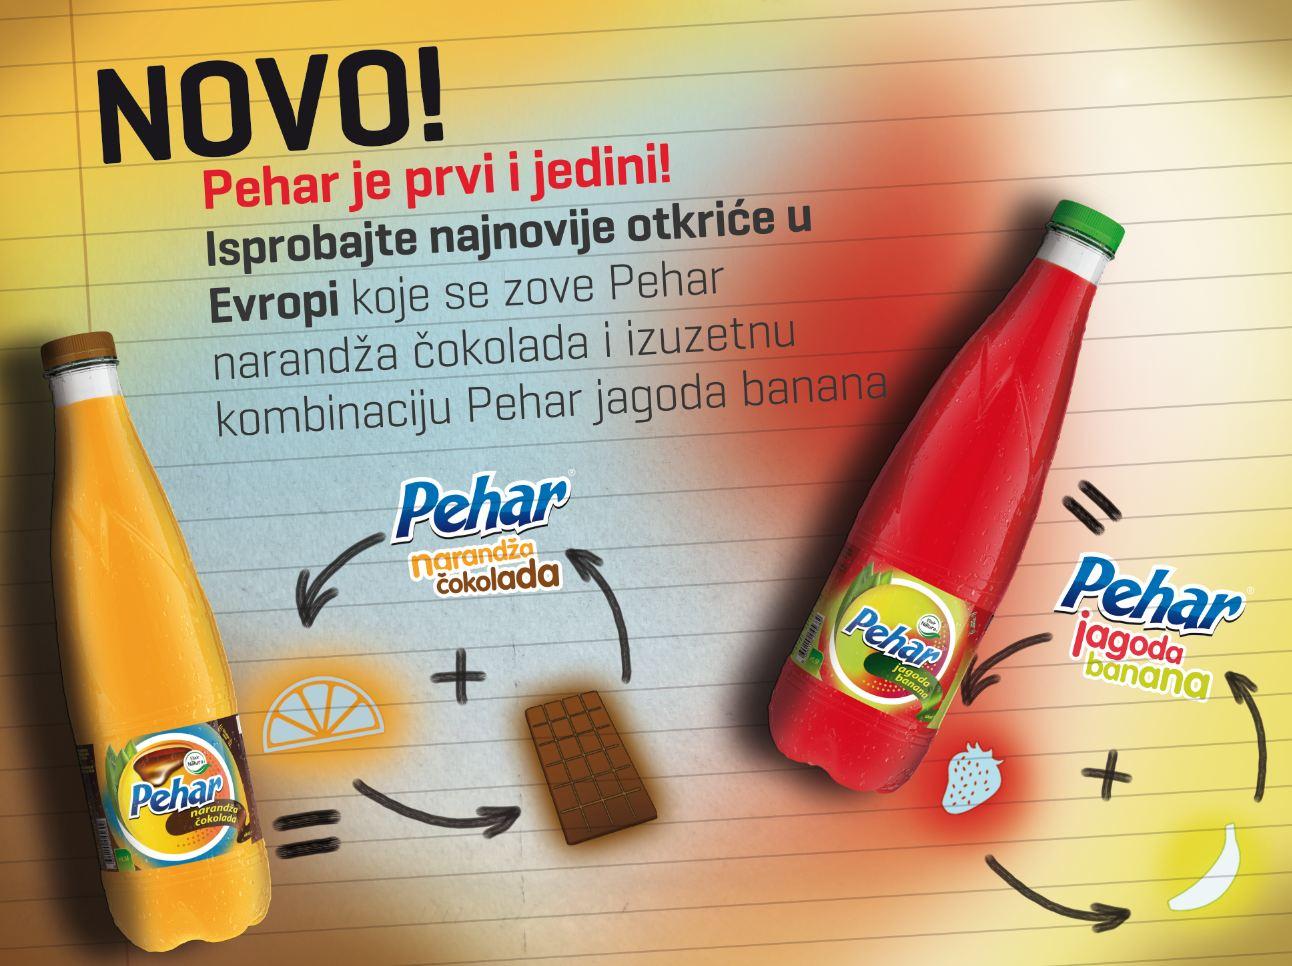 Elixir Natura doo Pehar narandža čokolada i Pehar jagoda banana